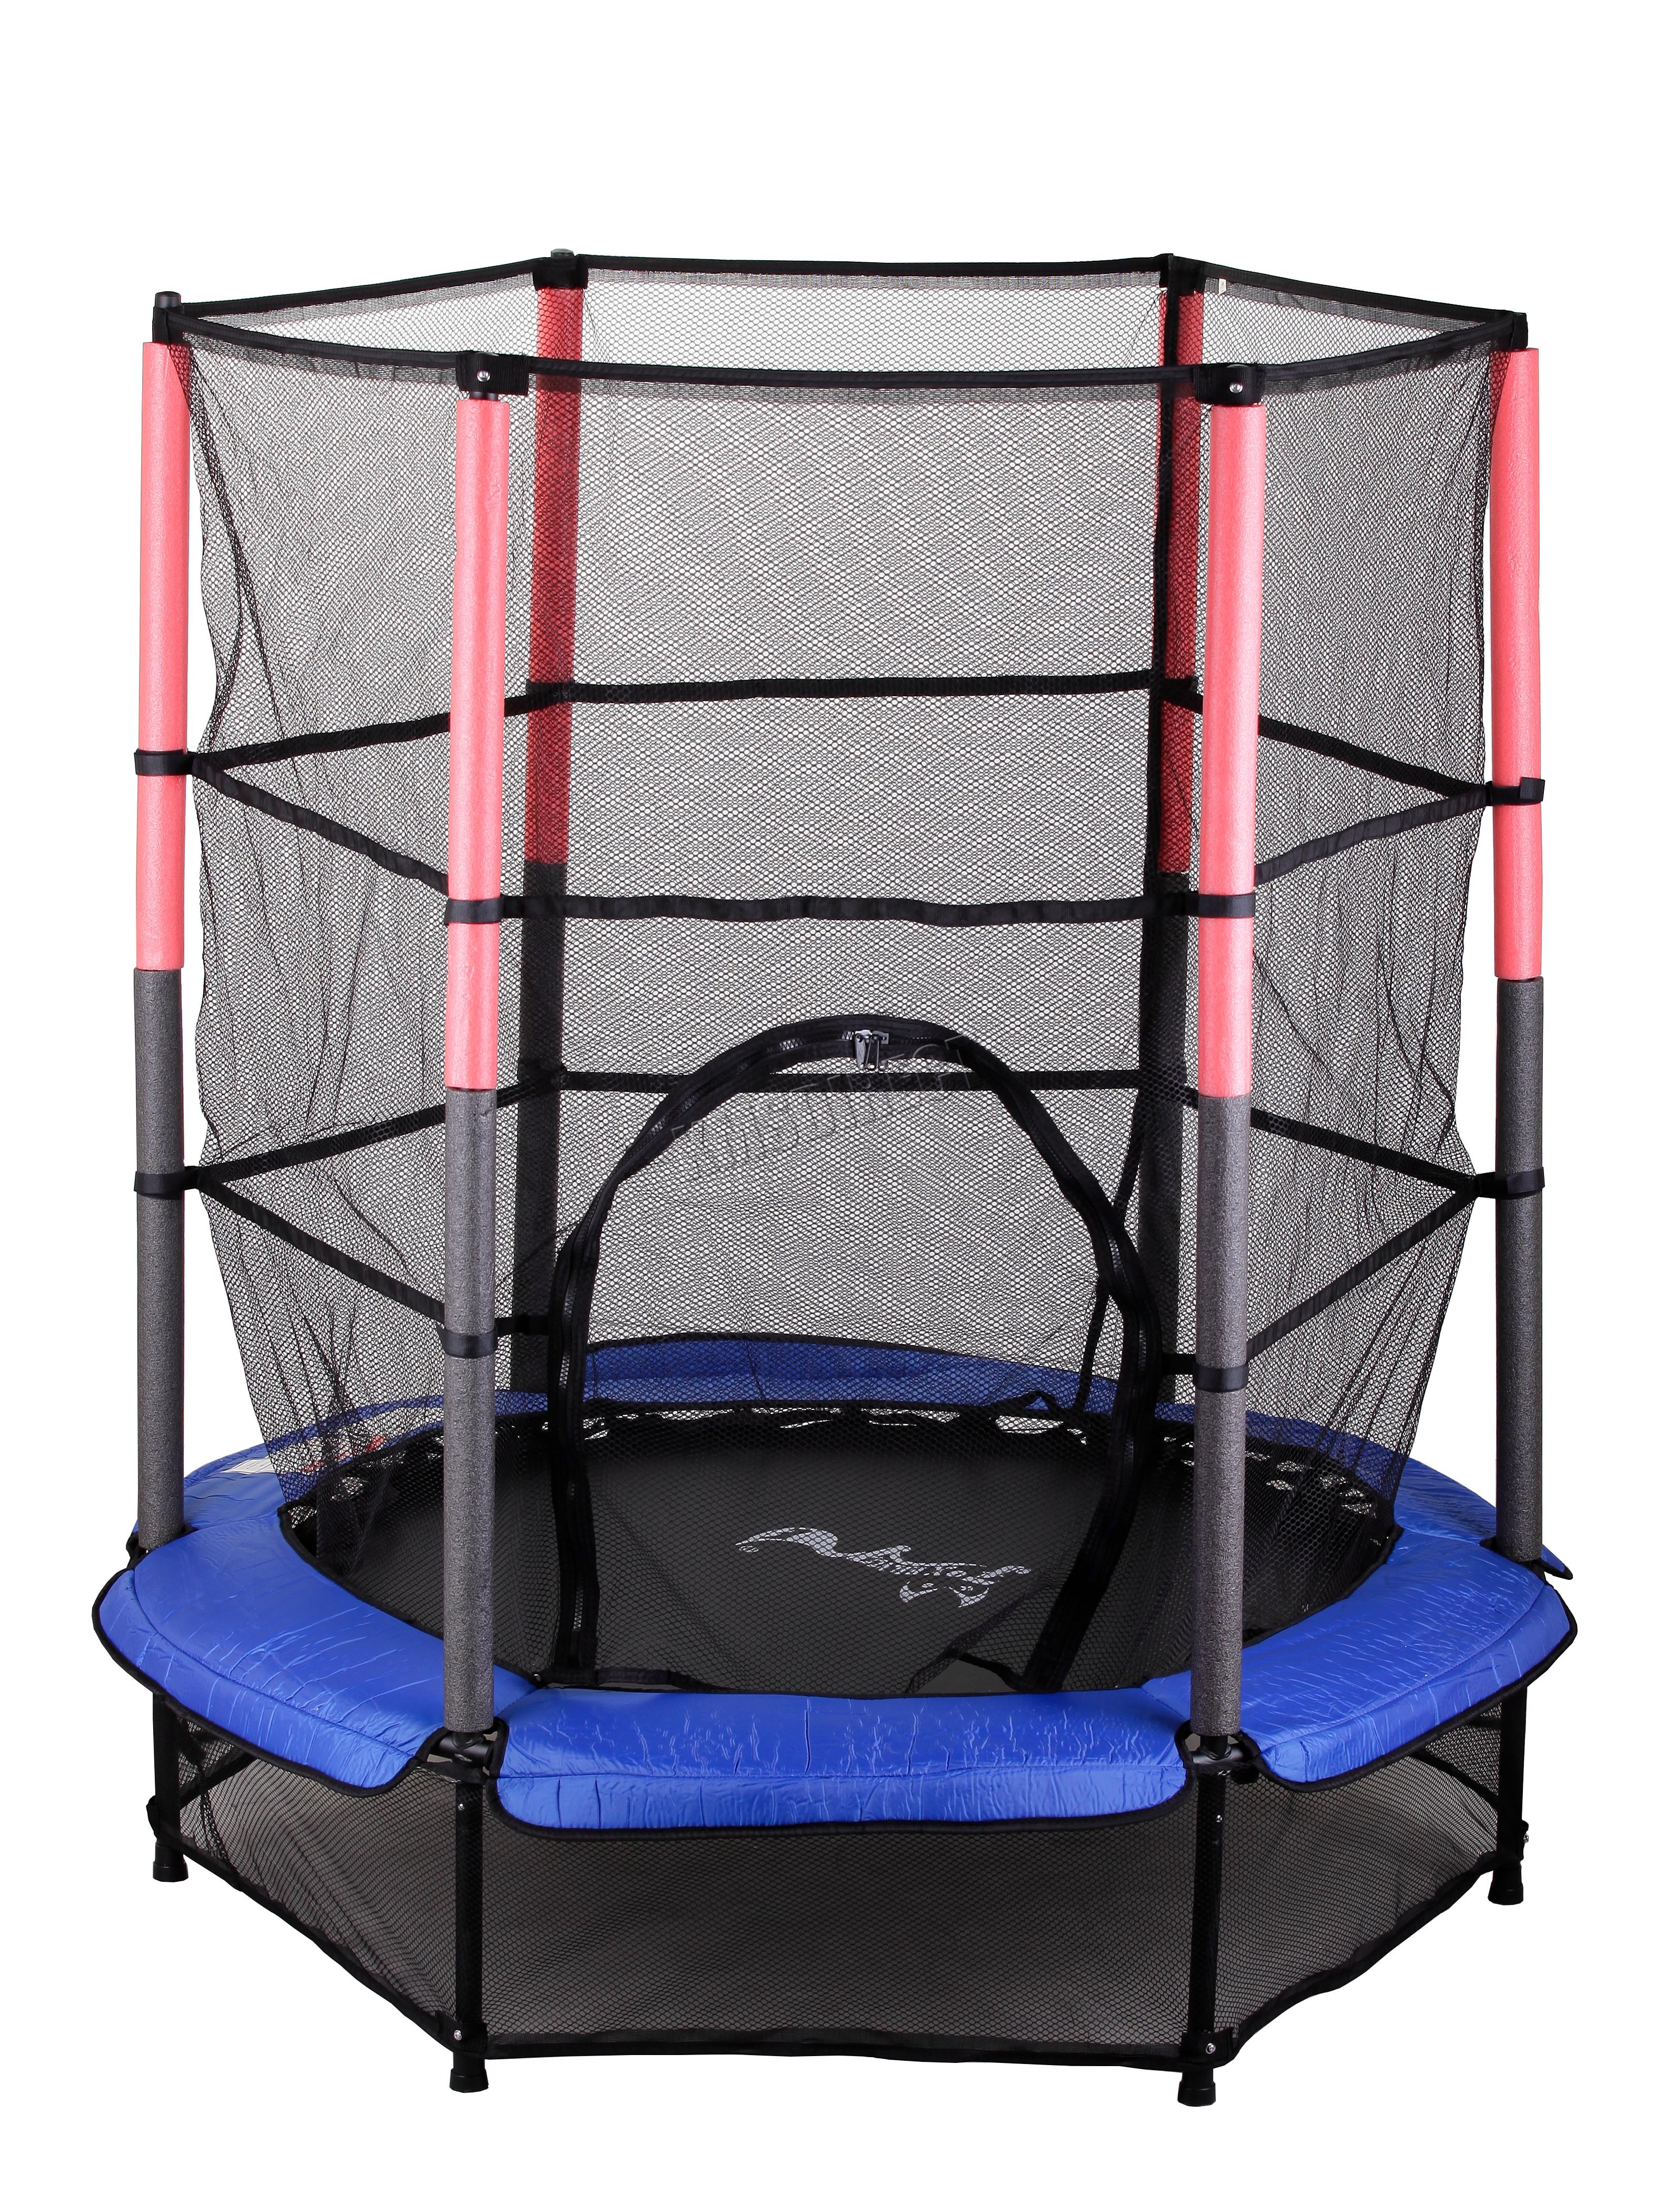 4-5FT-8FT-10FT-12FT-14FT-16FT-Trampoline-With-Ladder-Rain-Cover-Enclosure-Net